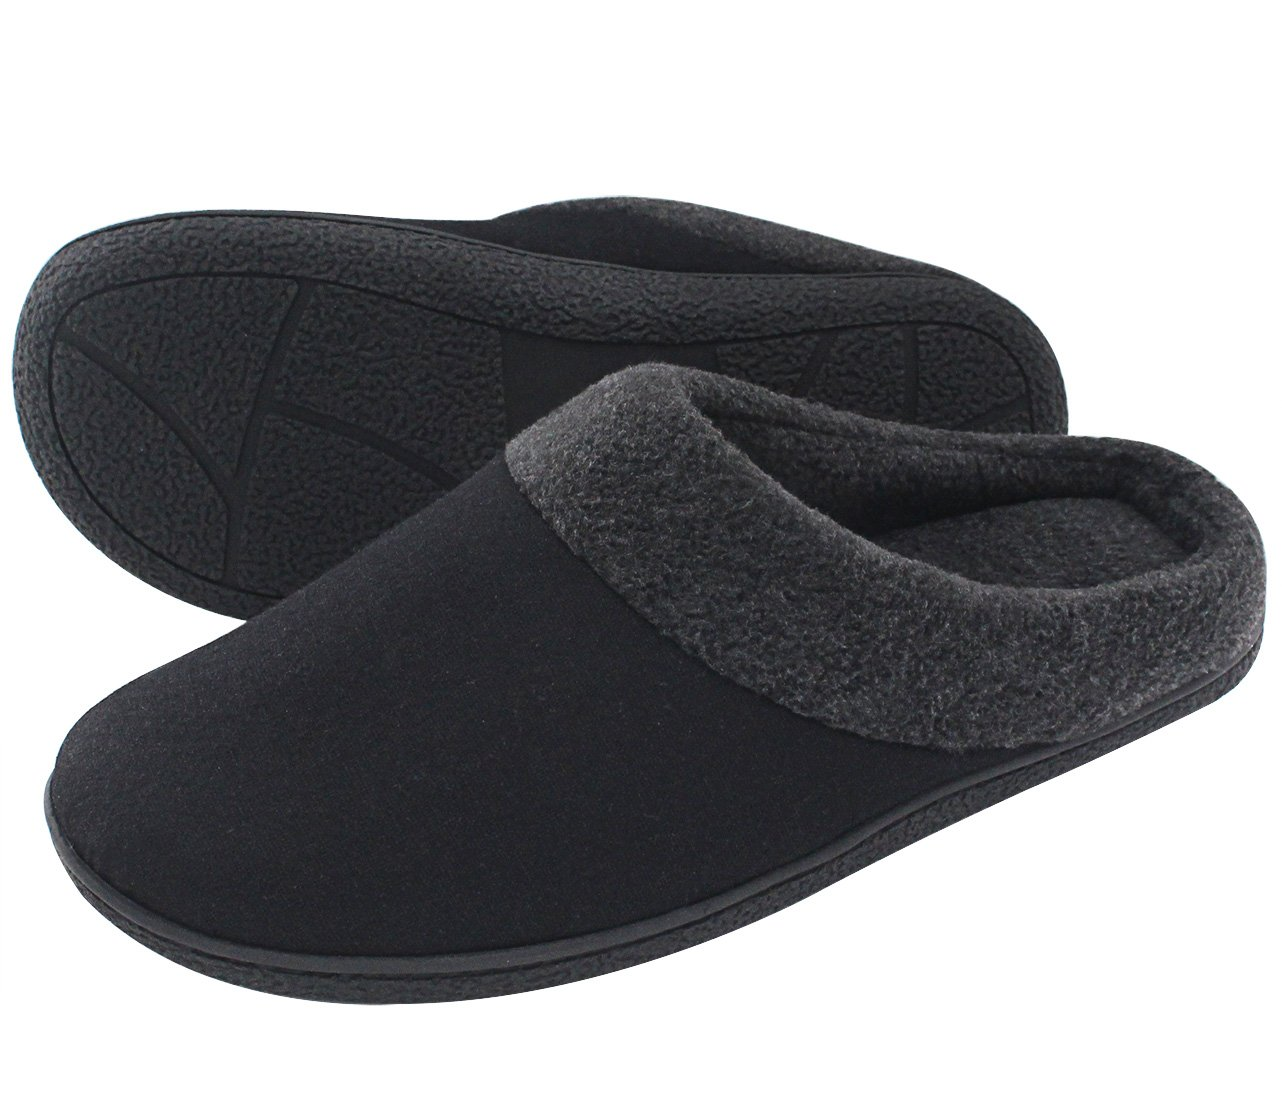 HomeIdeas Men's Woolen Fabric Memory Foam Anti-Slip House Slippers- Black/Large- US 11-12/ UK 10-11